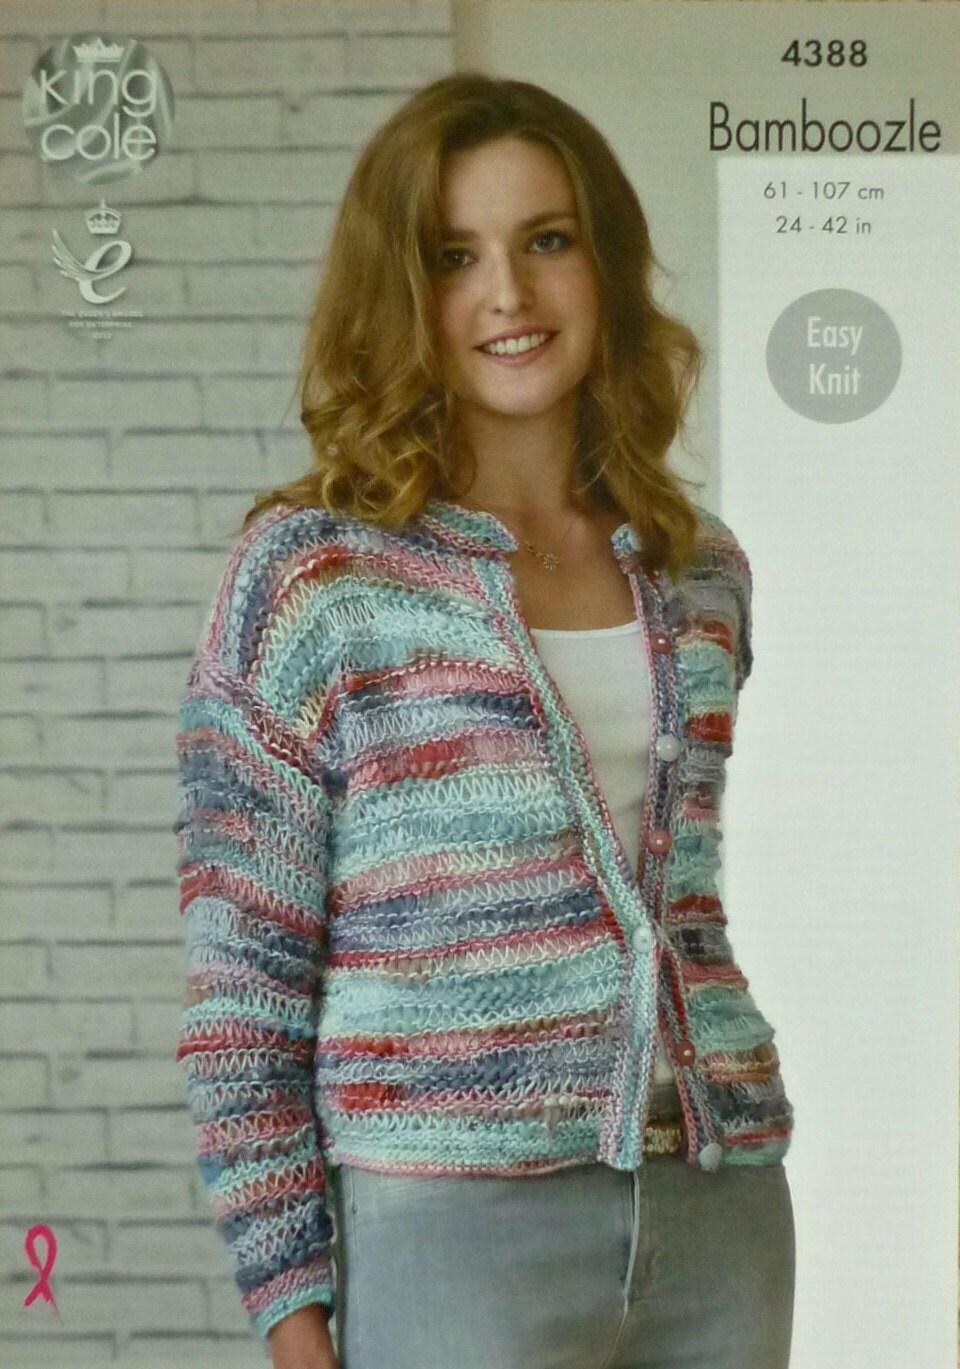 Womens Knitting Pattern K4388 Ladies/Childrens Long Sleeve Easy Knit ...